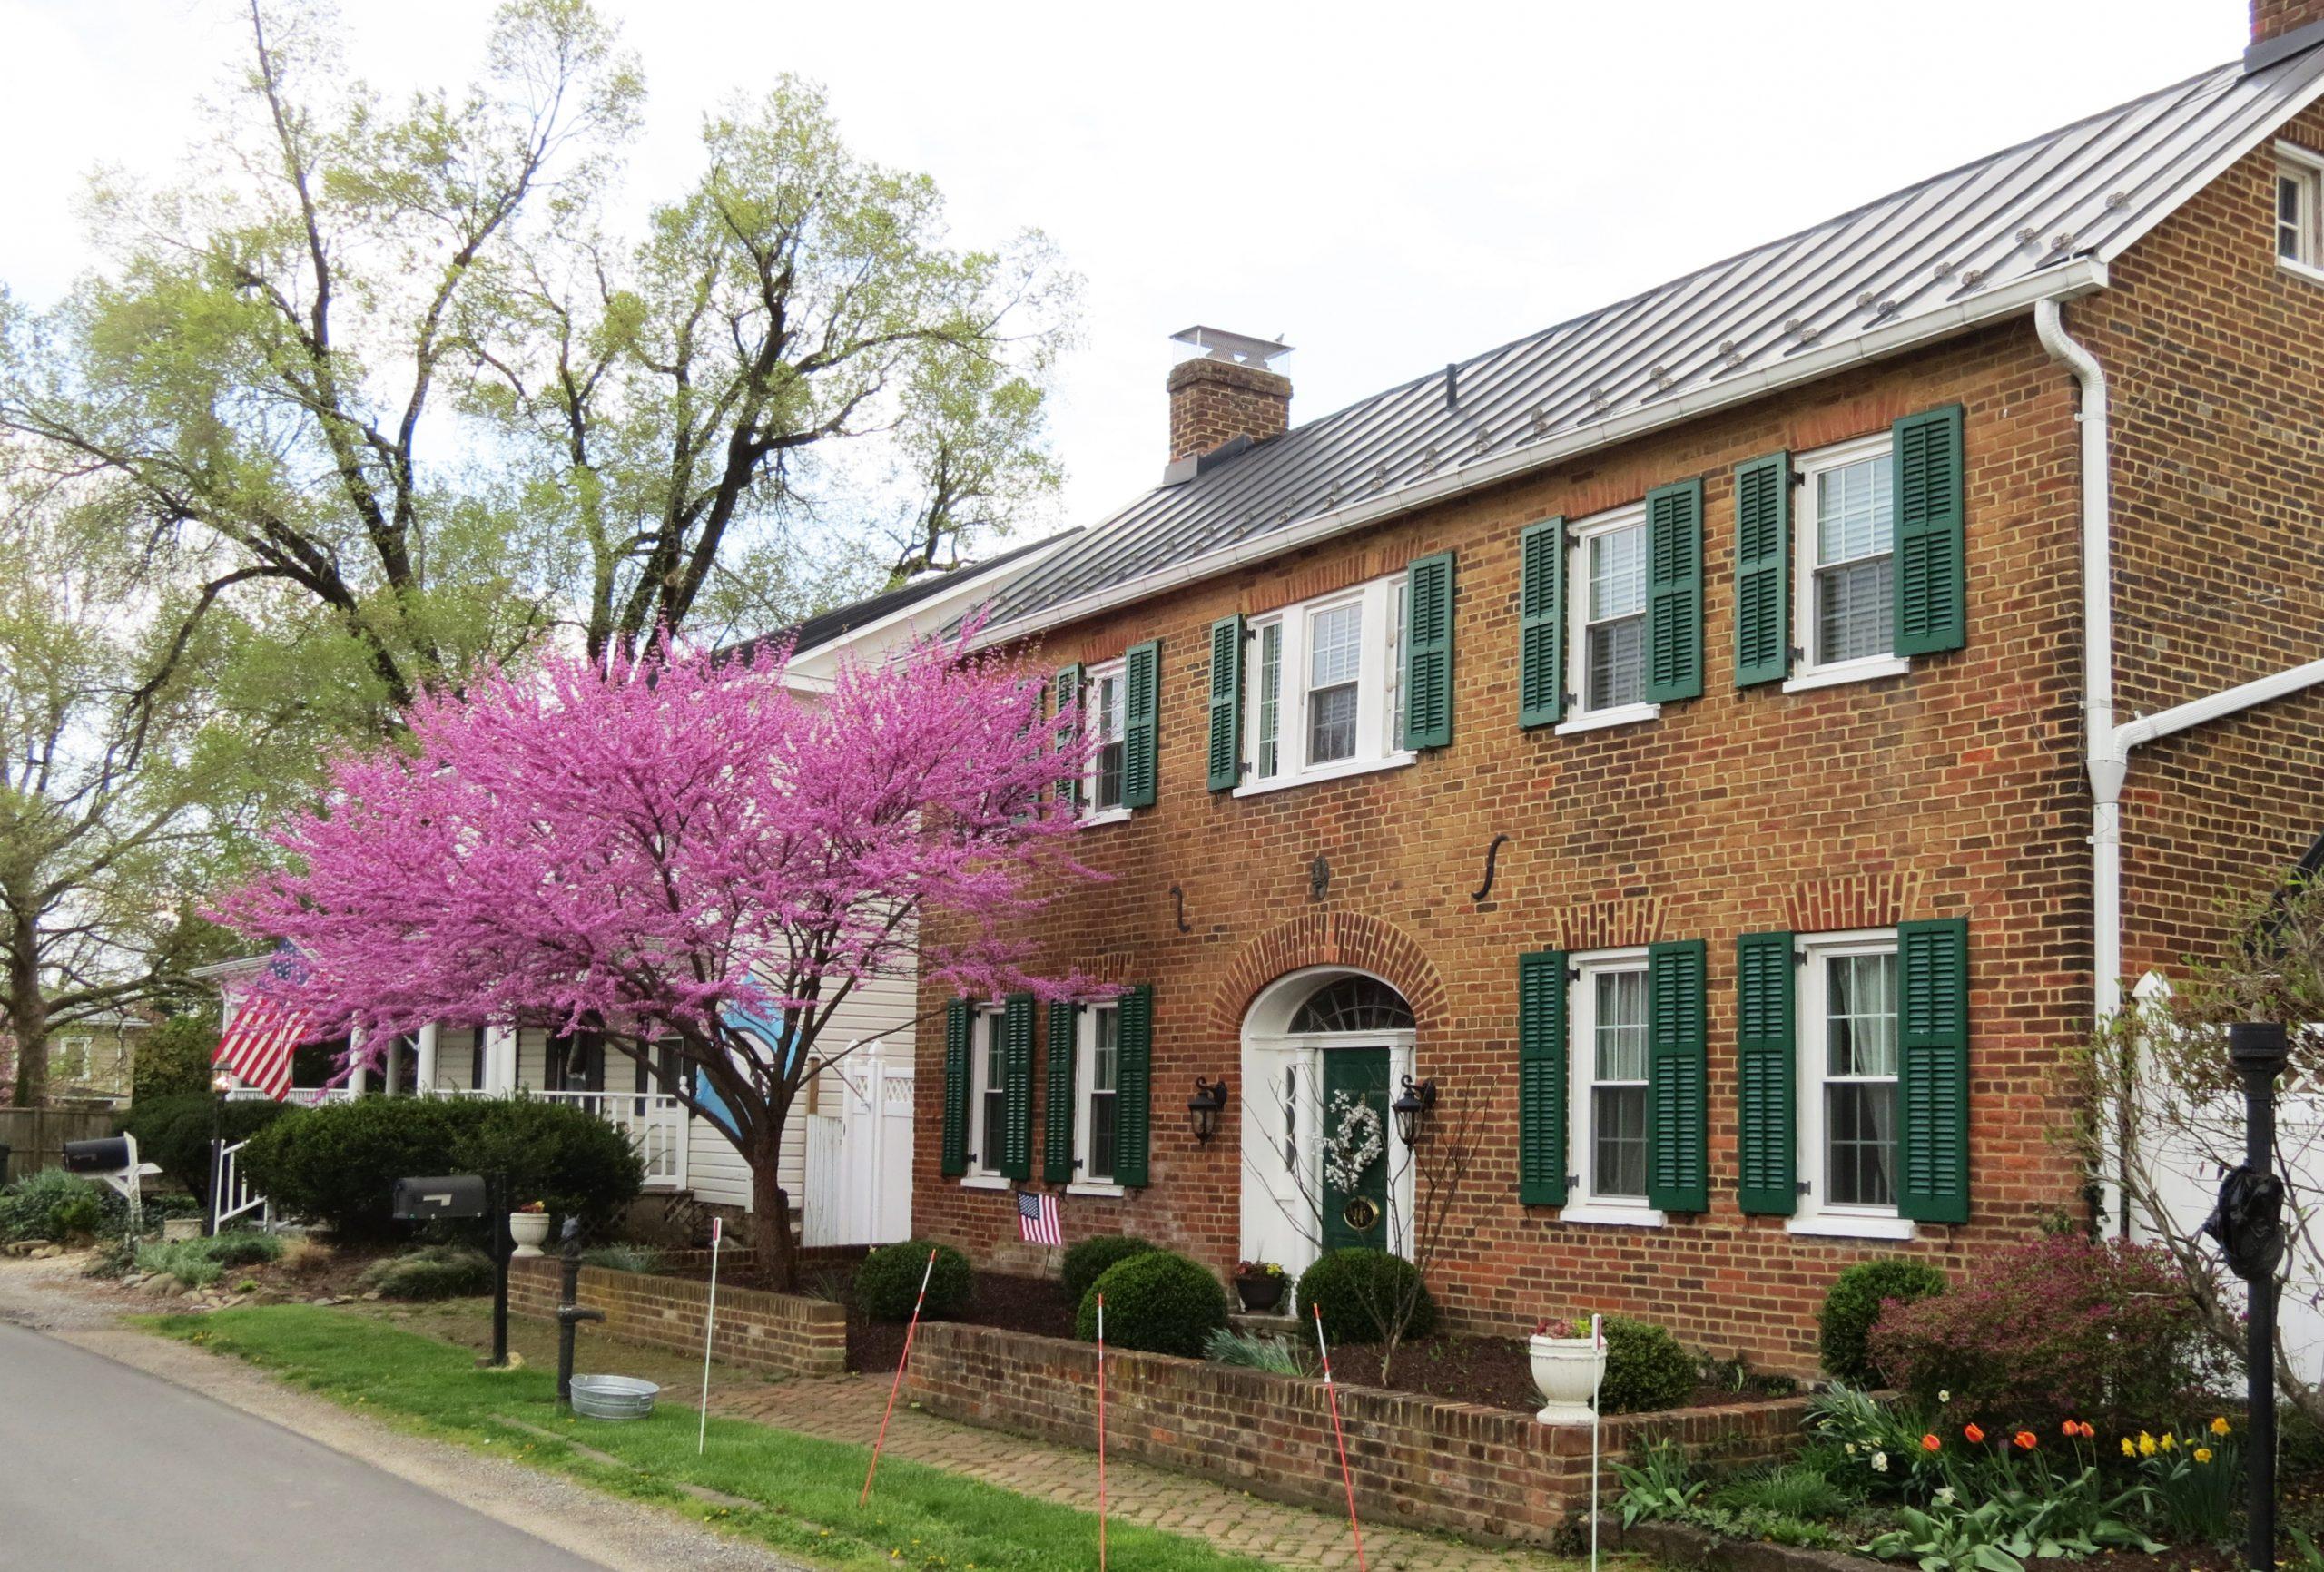 Lovettsville Historic District